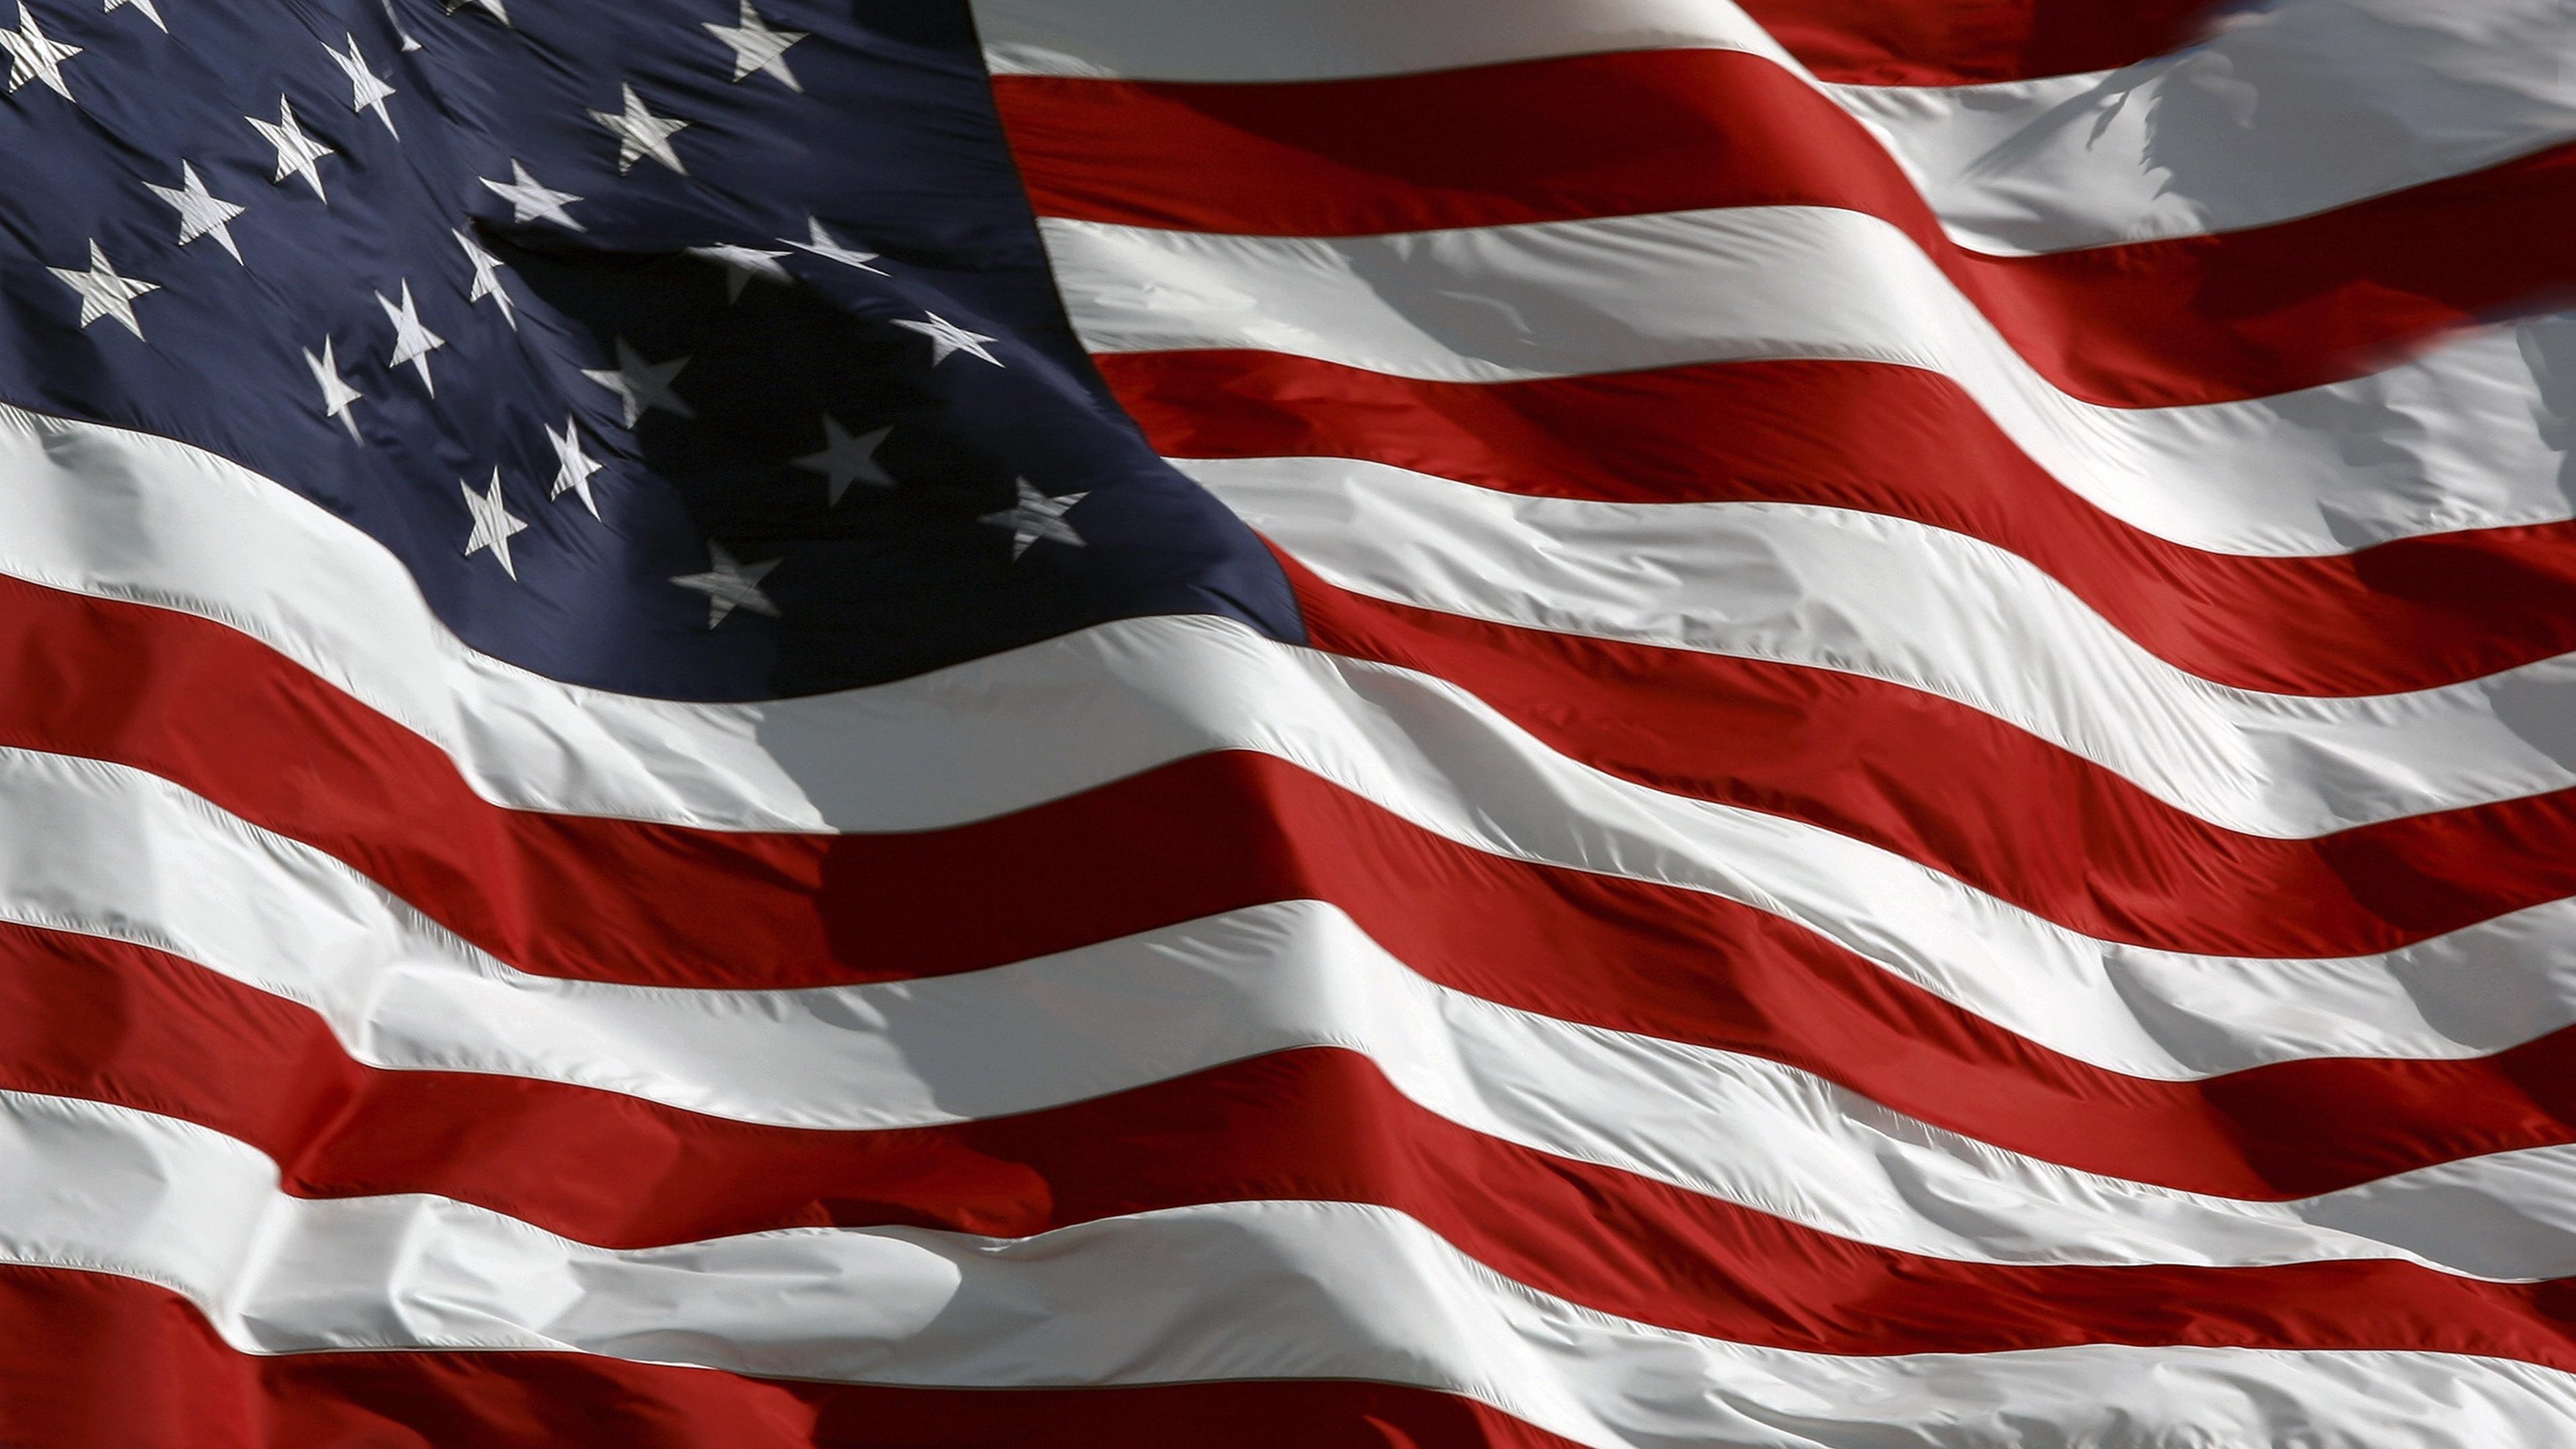 american flag for desktop wallpapers hd : wallpapers13